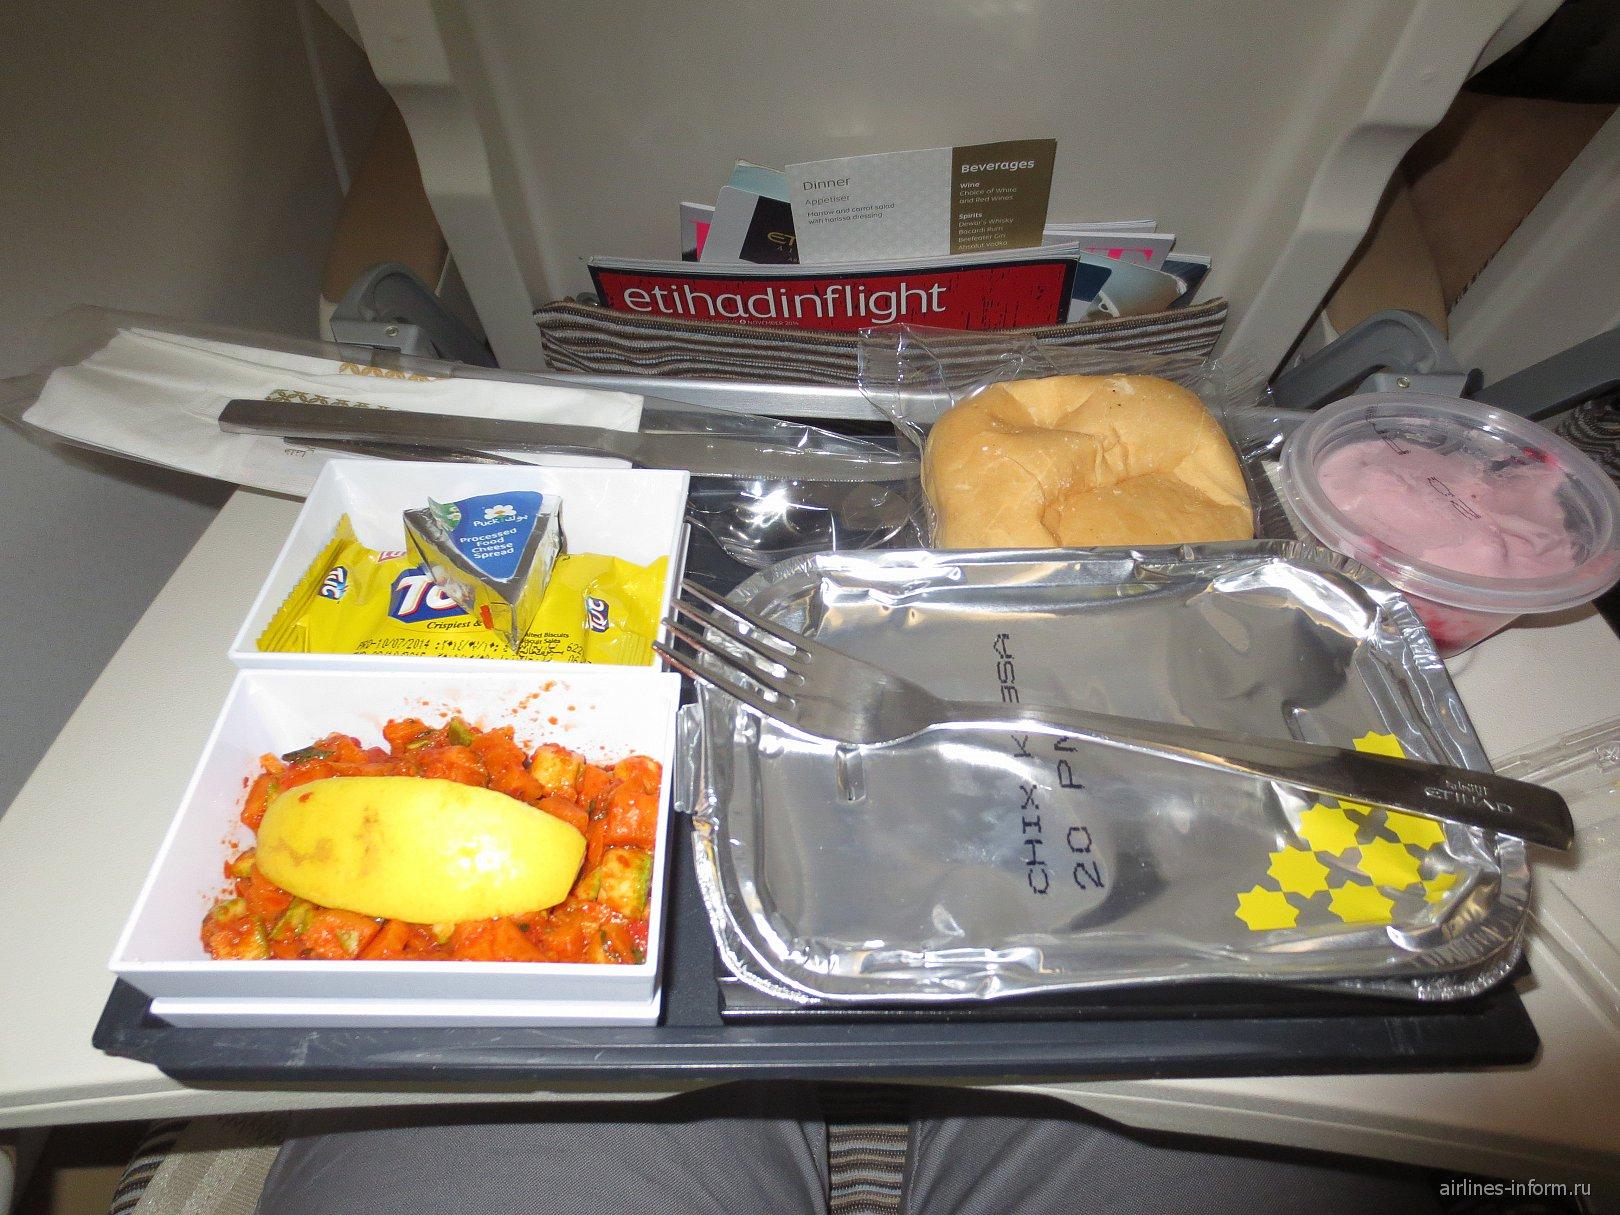 Бортовое питание на рейсе Бейрут-Абу-Даби авиакомпании Etihad Airways